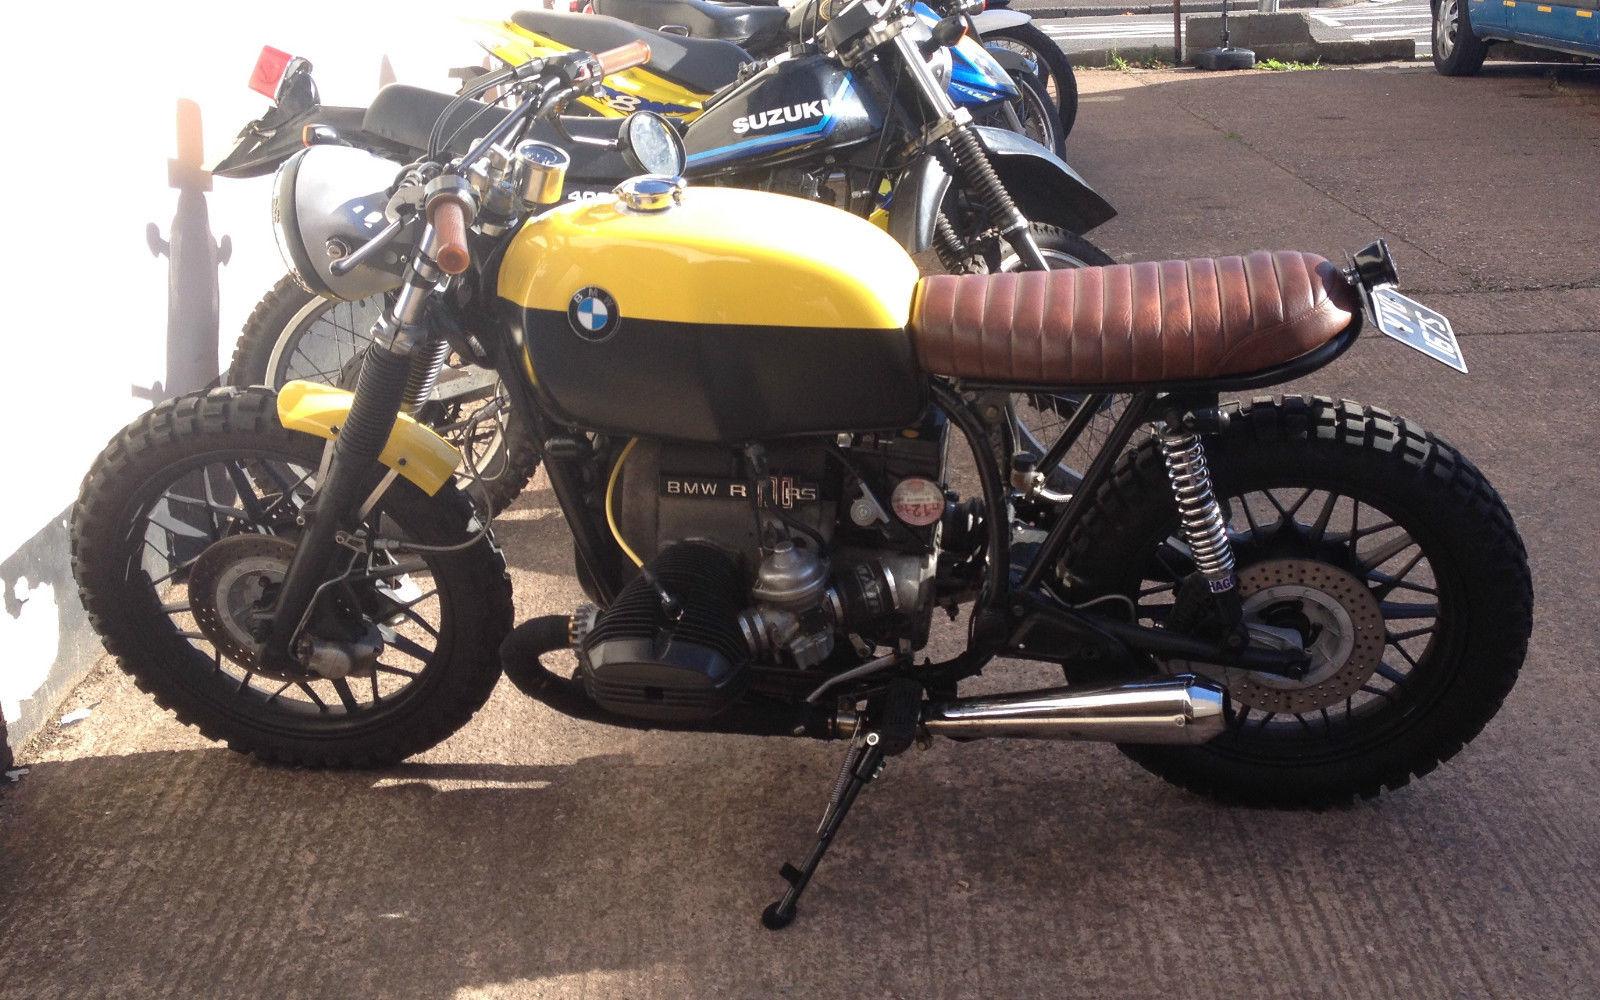 Bmw R100rs 1978 Street Scrambler Cafe Racer Brat Style